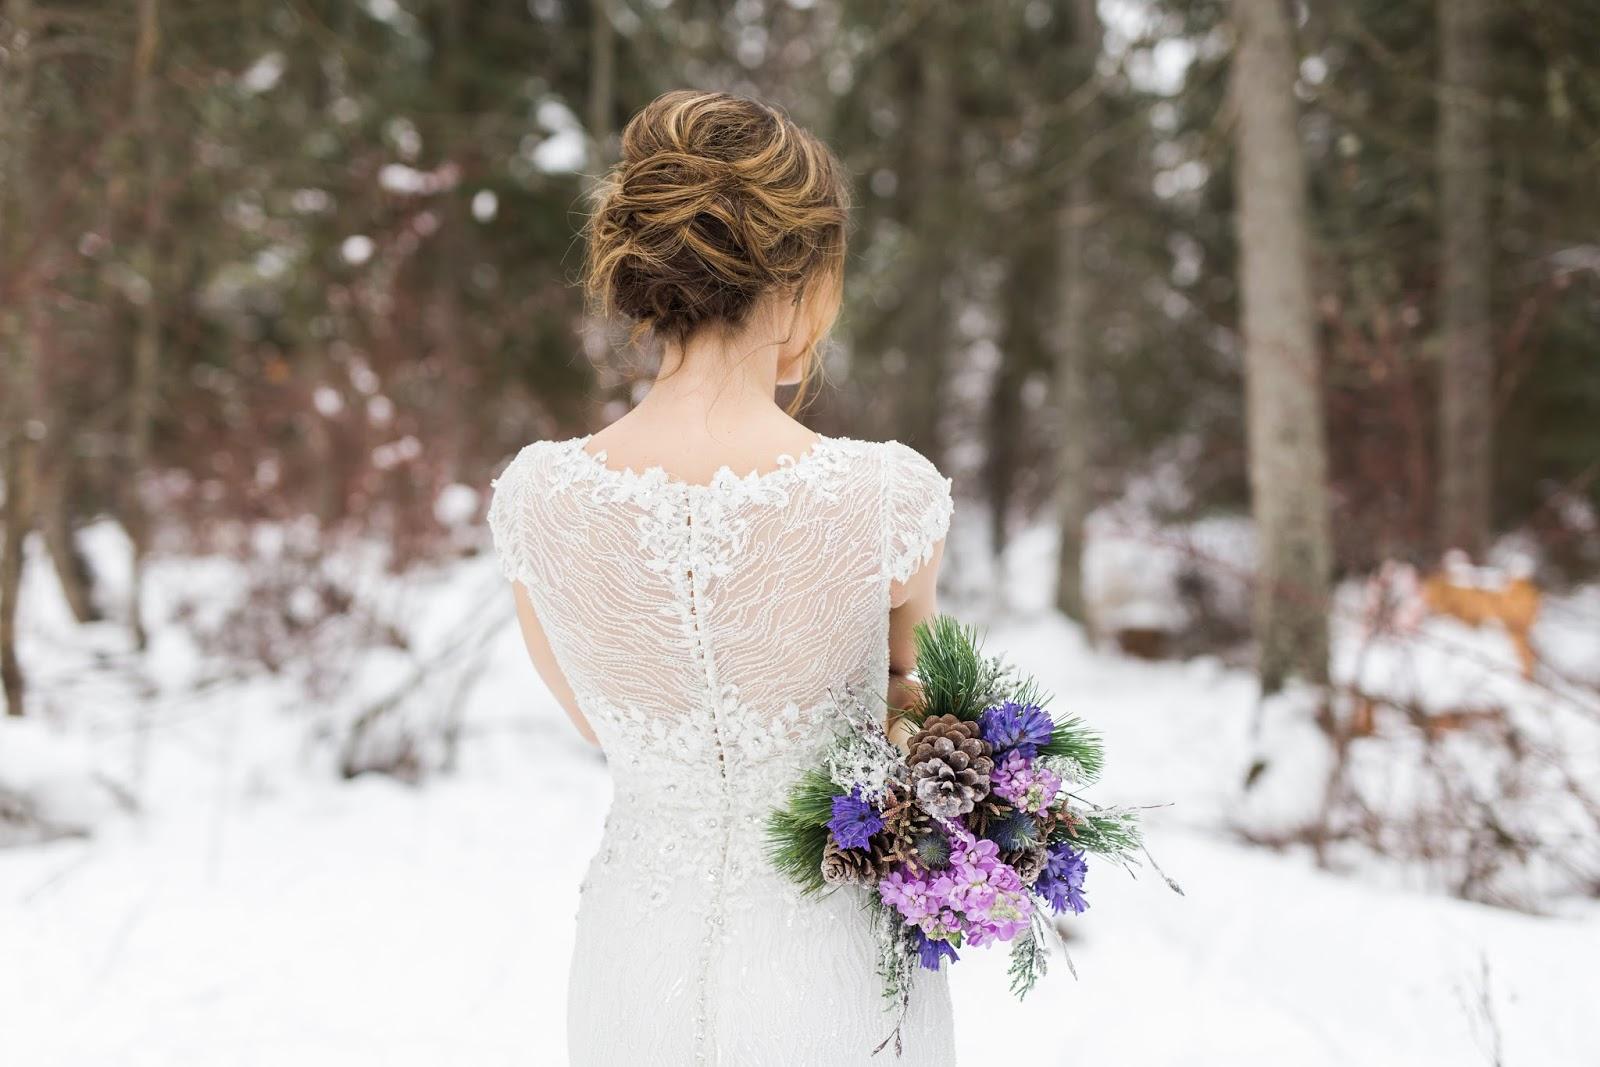 wedding dress lace back, Photography by Dina Remi